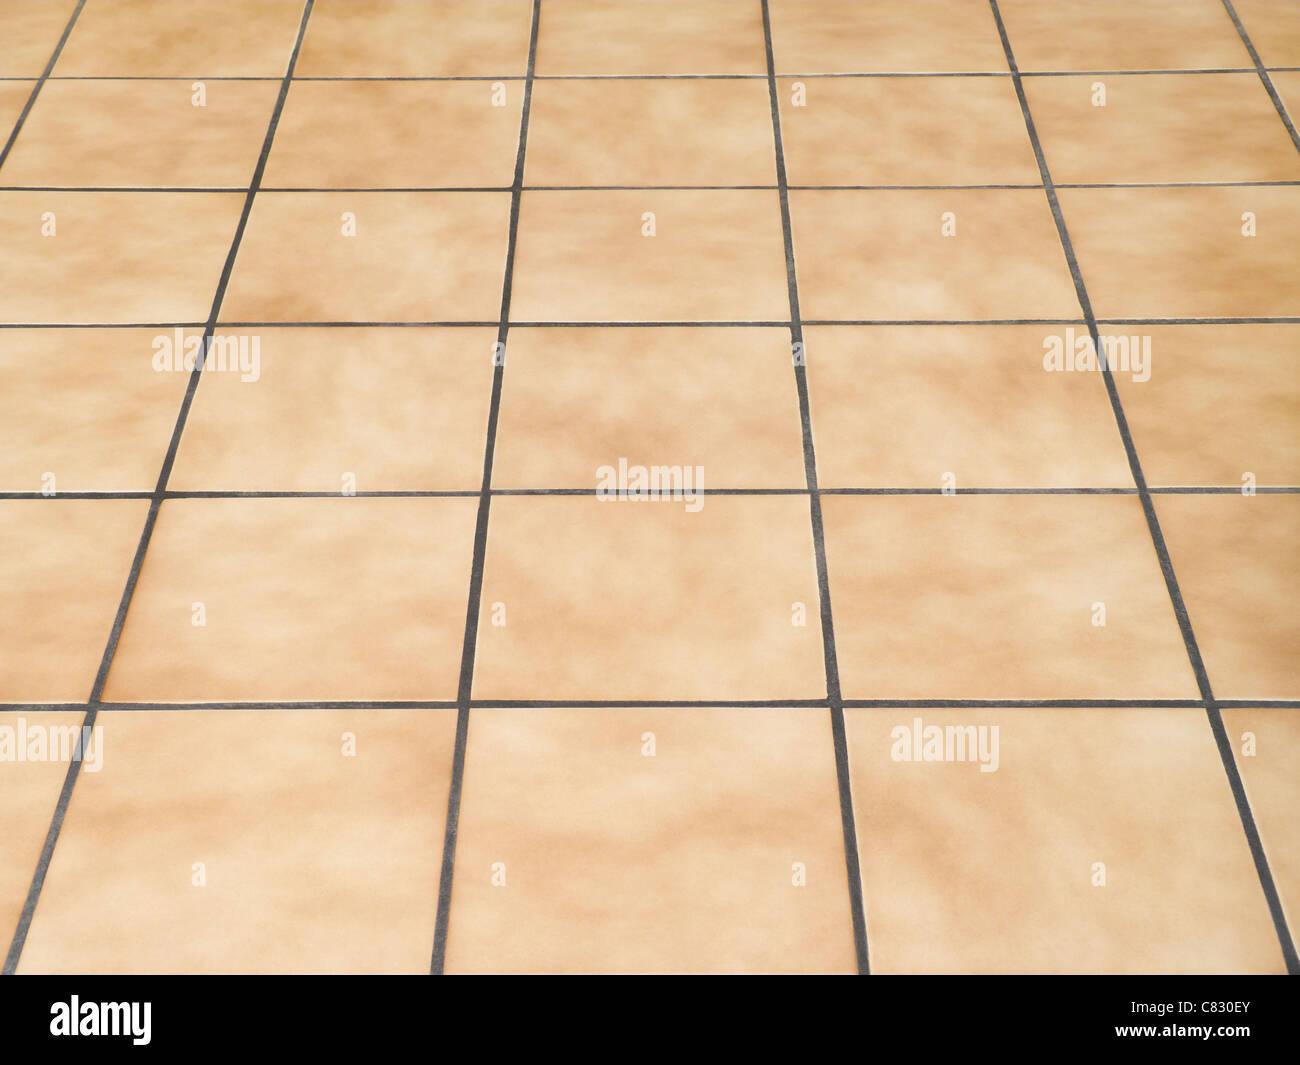 Ceramic Floor Tiles - Stock Image